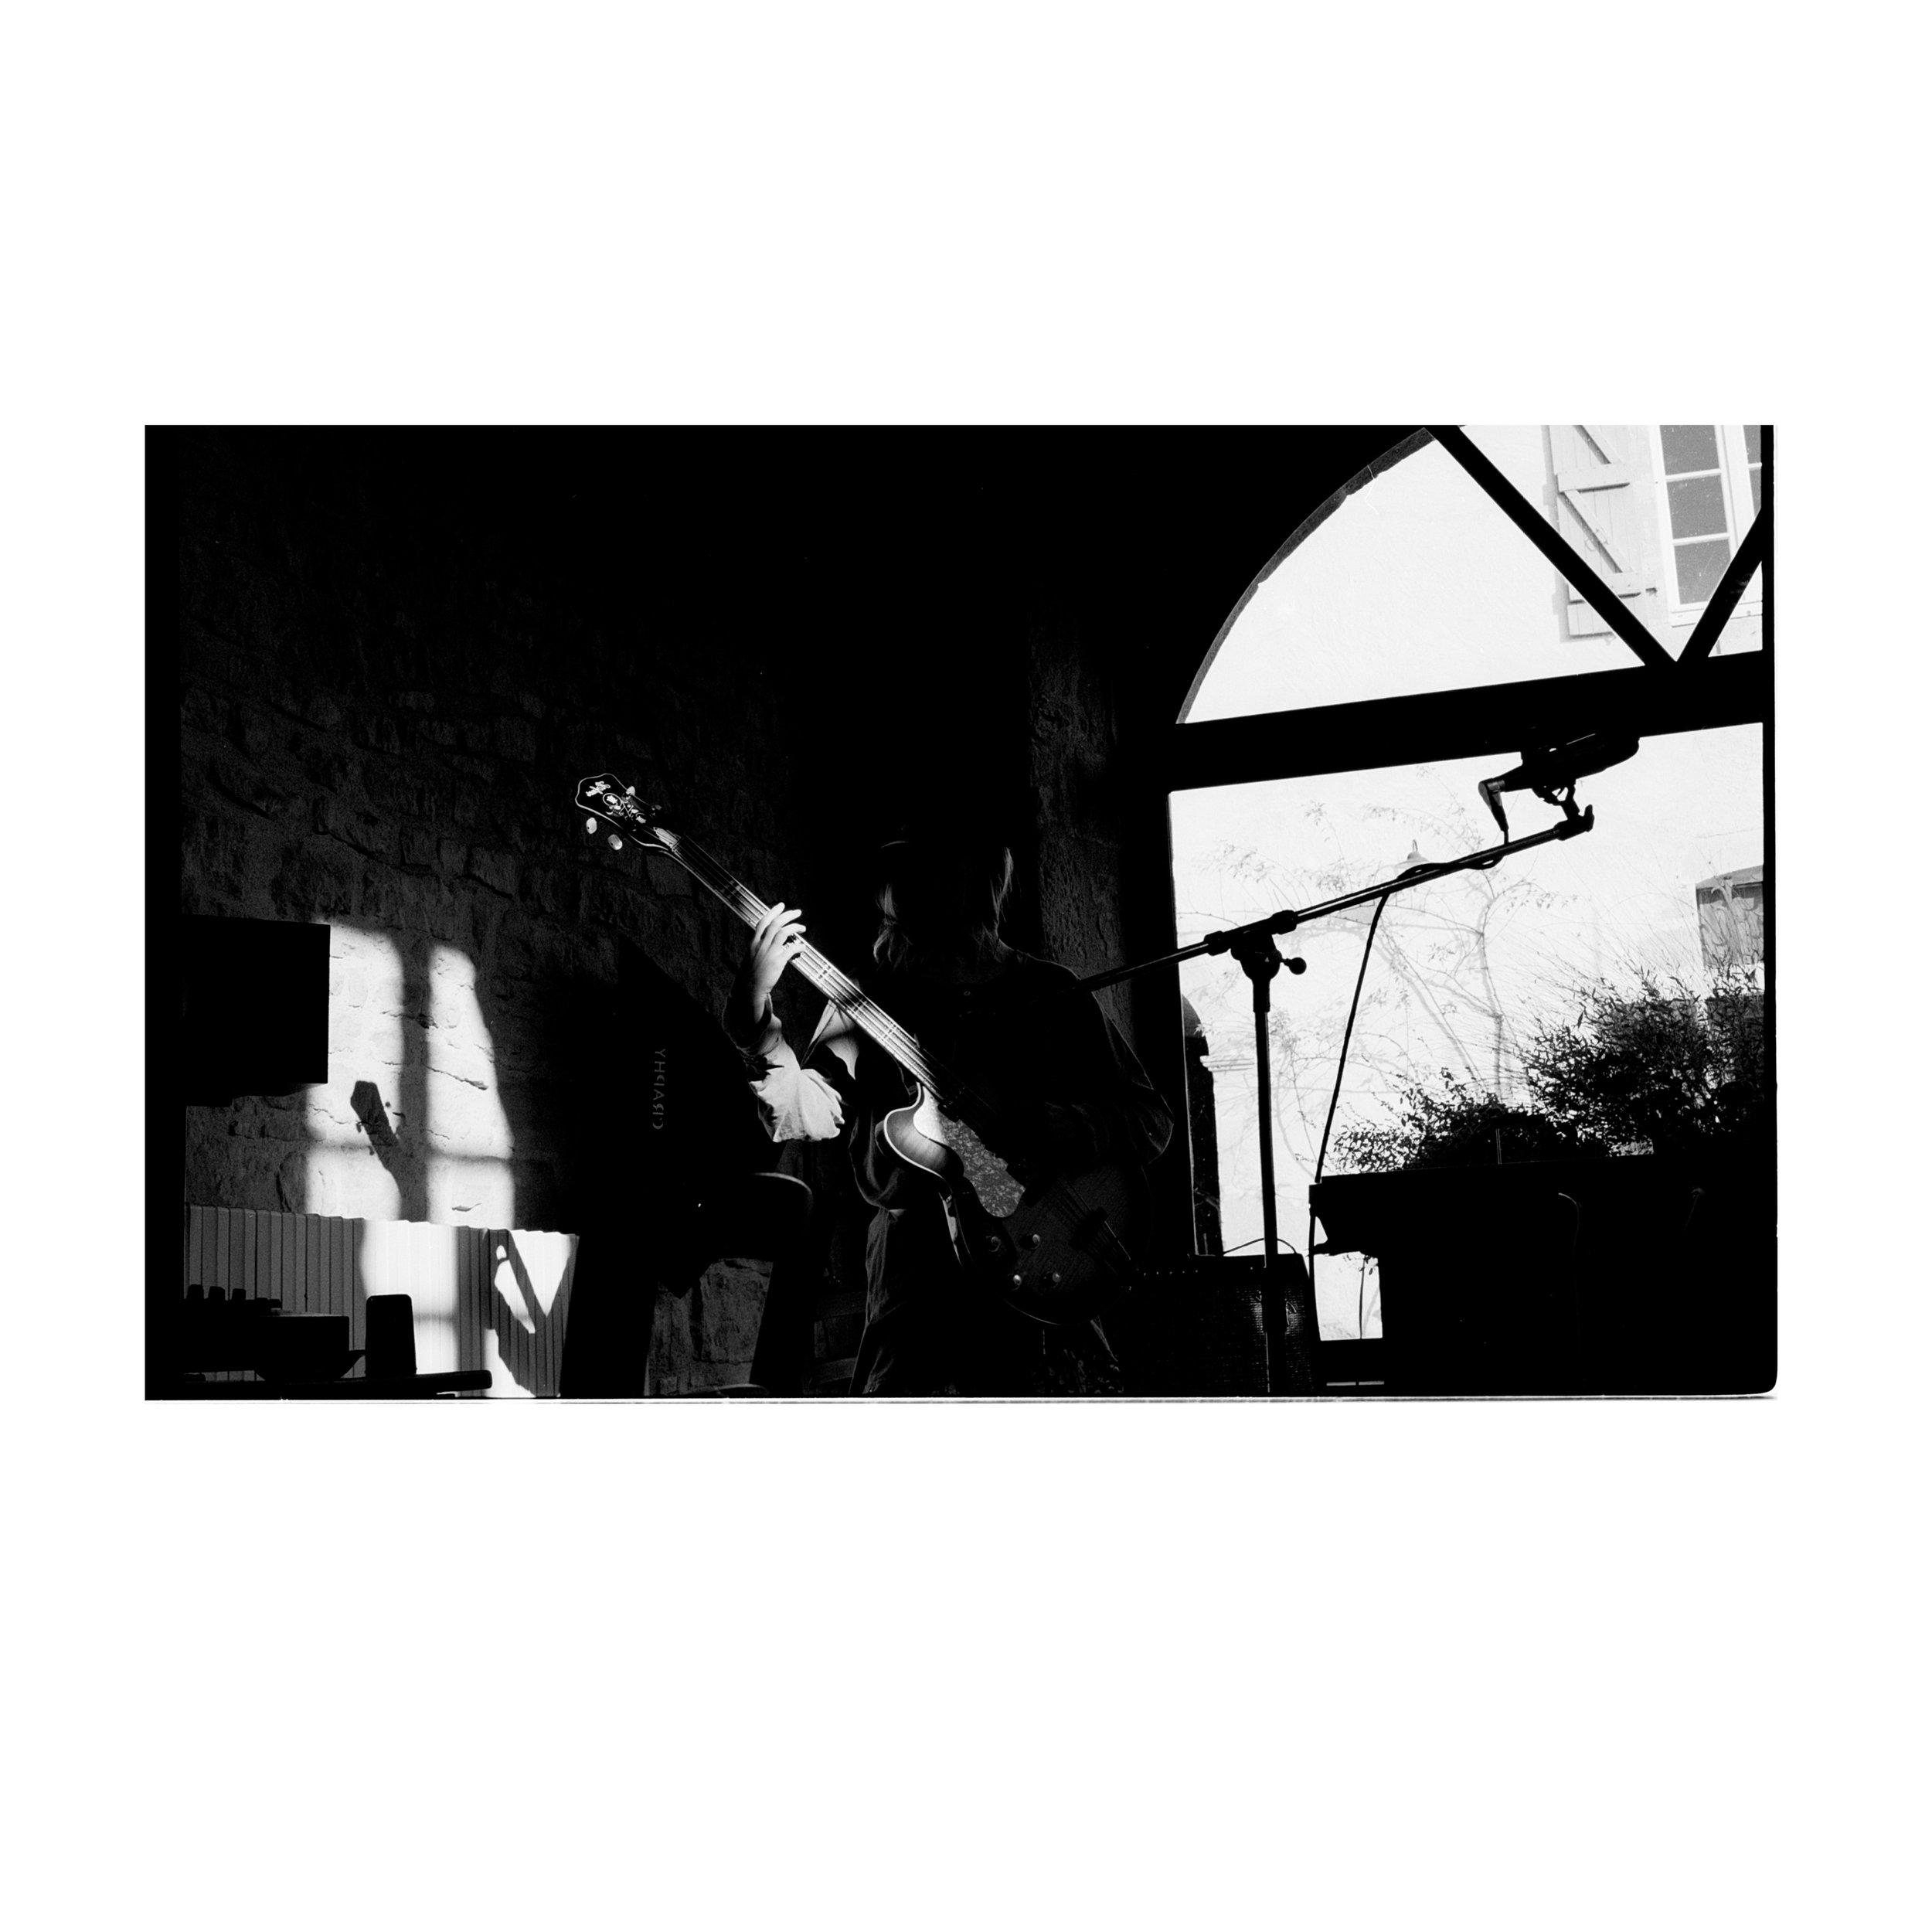 Samana, Samana Music, Samana band portrait, Analogue Photography